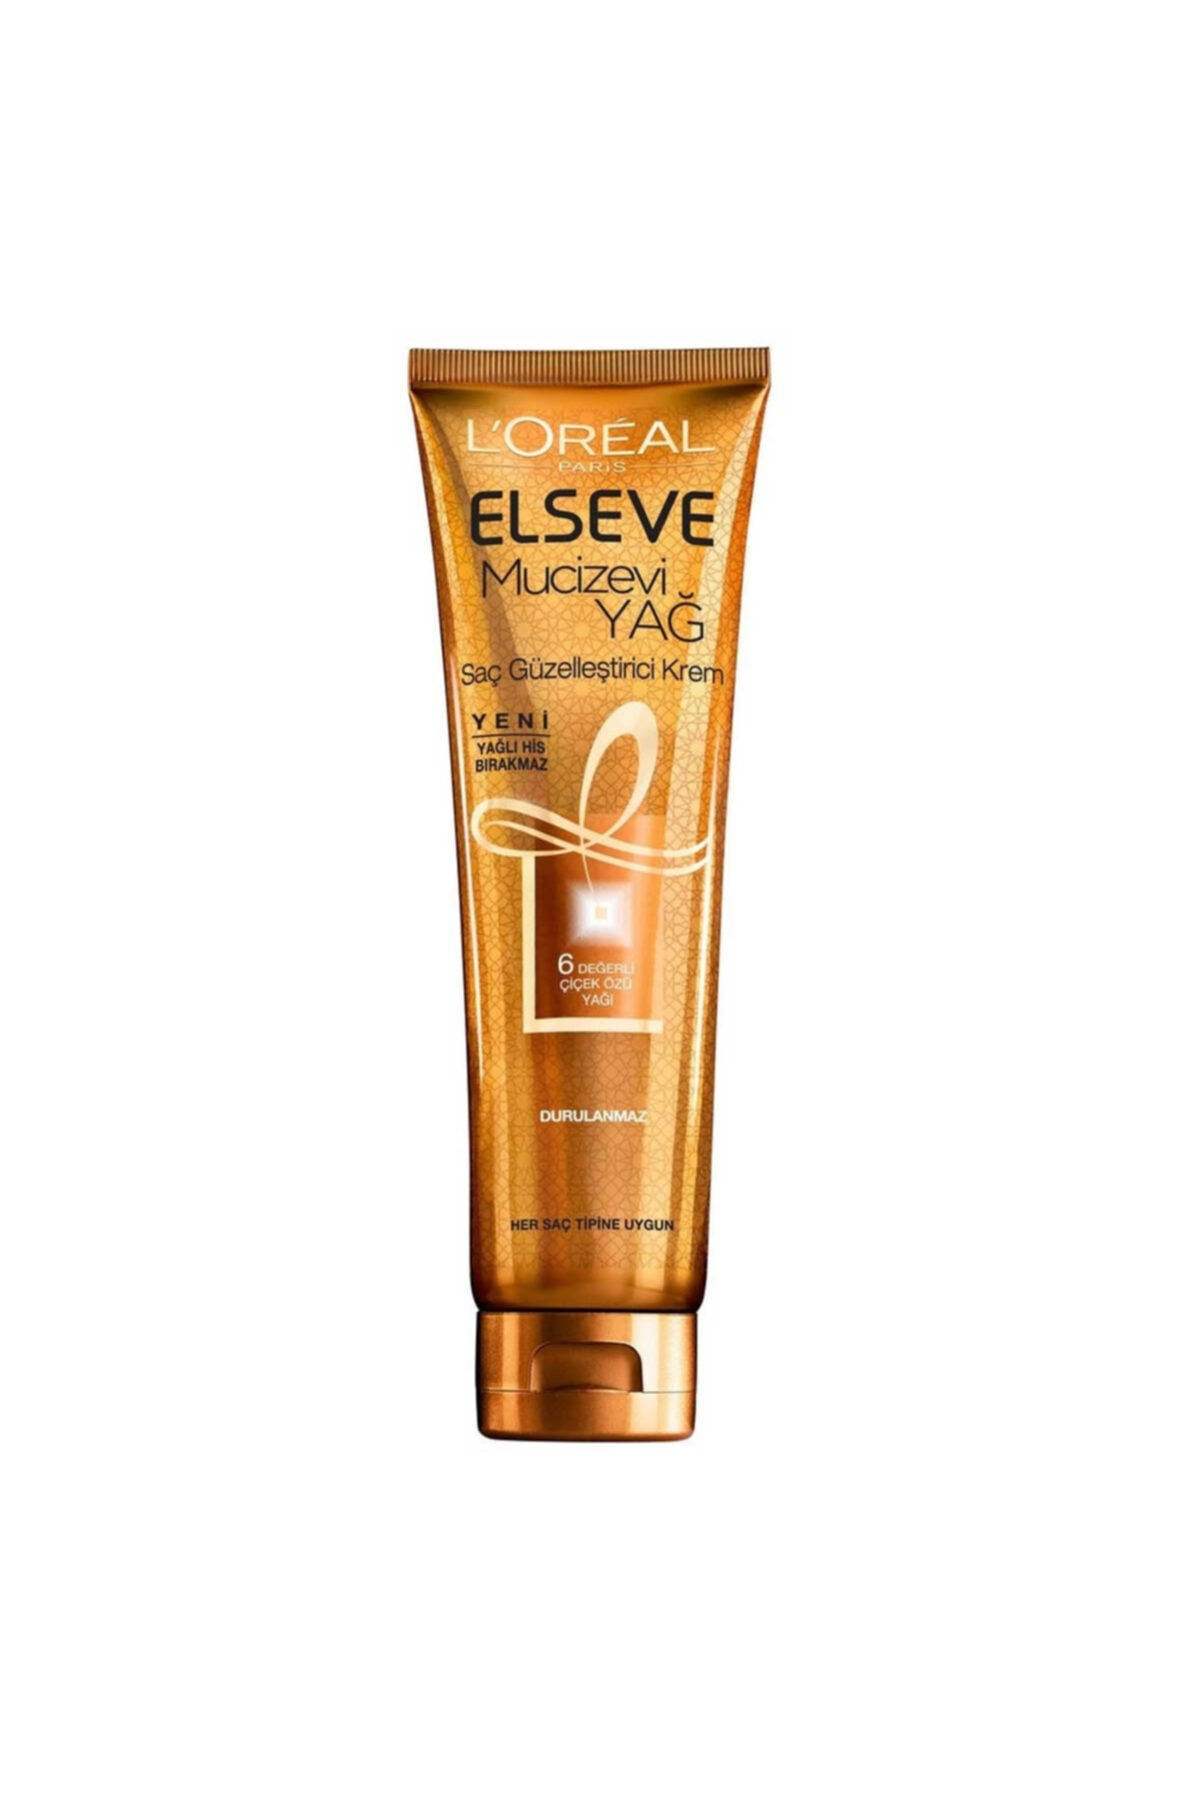 L'Oreal Paris L'oréal Paris Elseve Mucizevi Yağ Saç Güzelleştirici Krem 150 Ml 1